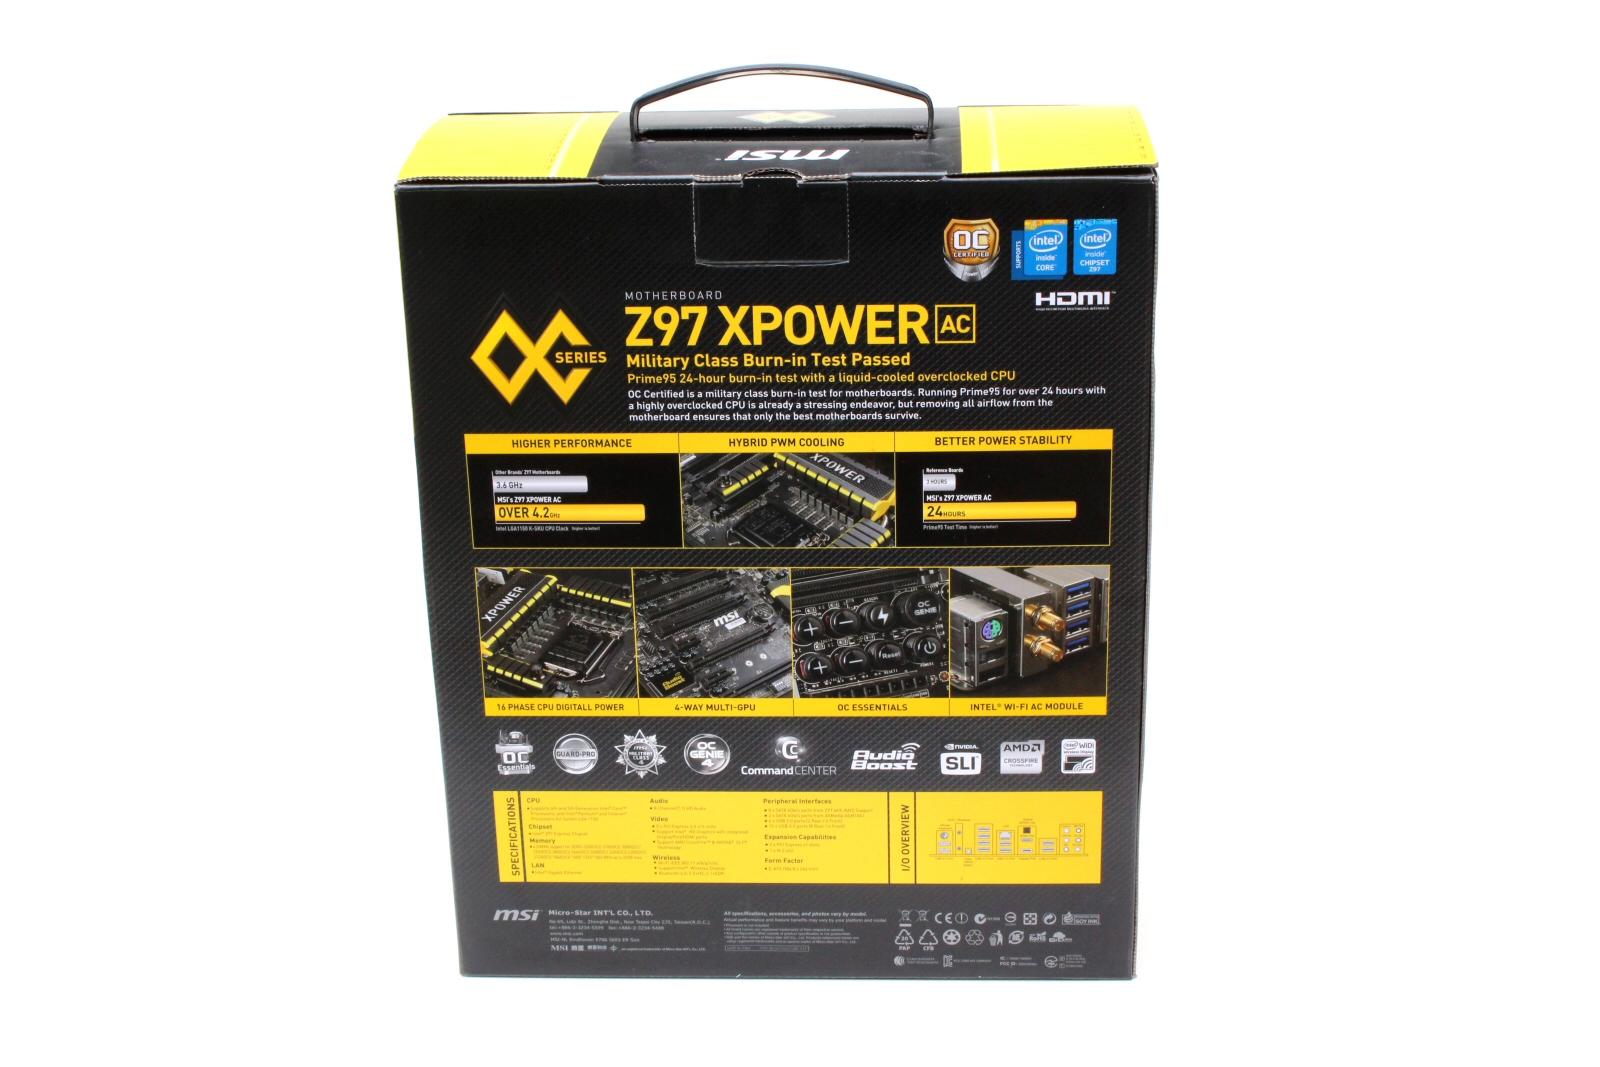 [Review] MSI Z97 XPower AC-img_5245.jpg